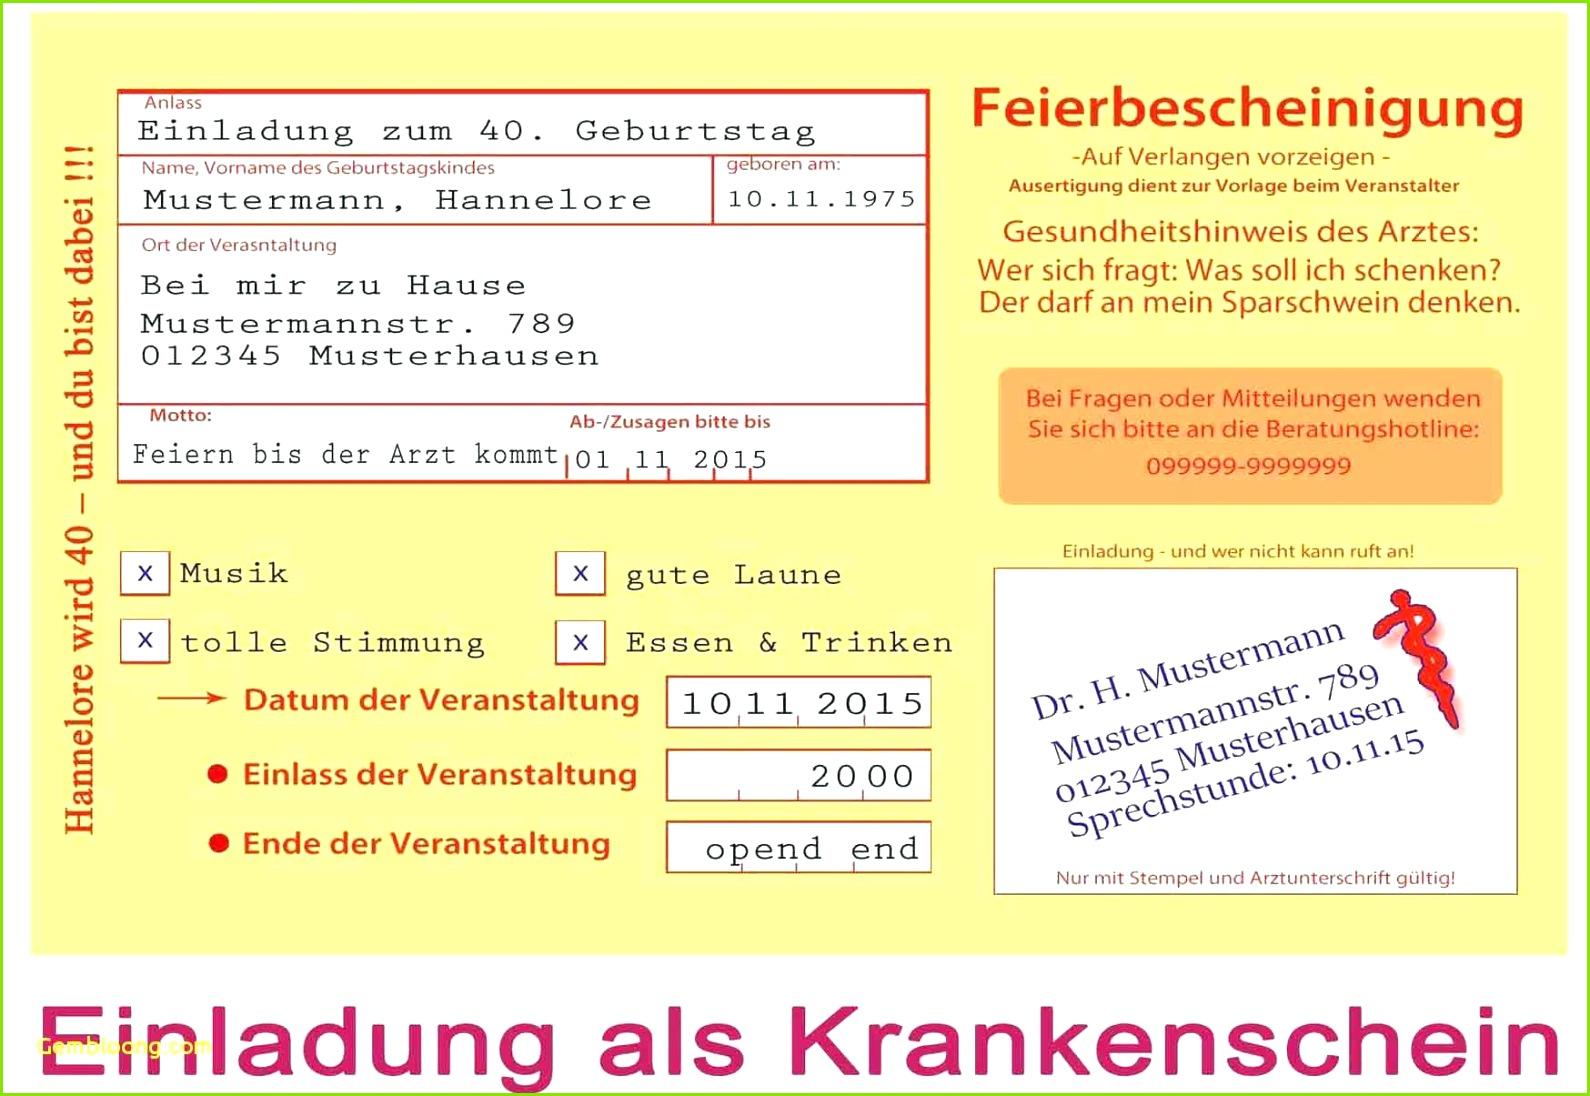 Einladung 50 Geburtstag Einladung 60 Geburtstag Vorlagen Kostenlos Einladungskarten Vorlagen Geburtstag Vorlagen Einladungen 0d